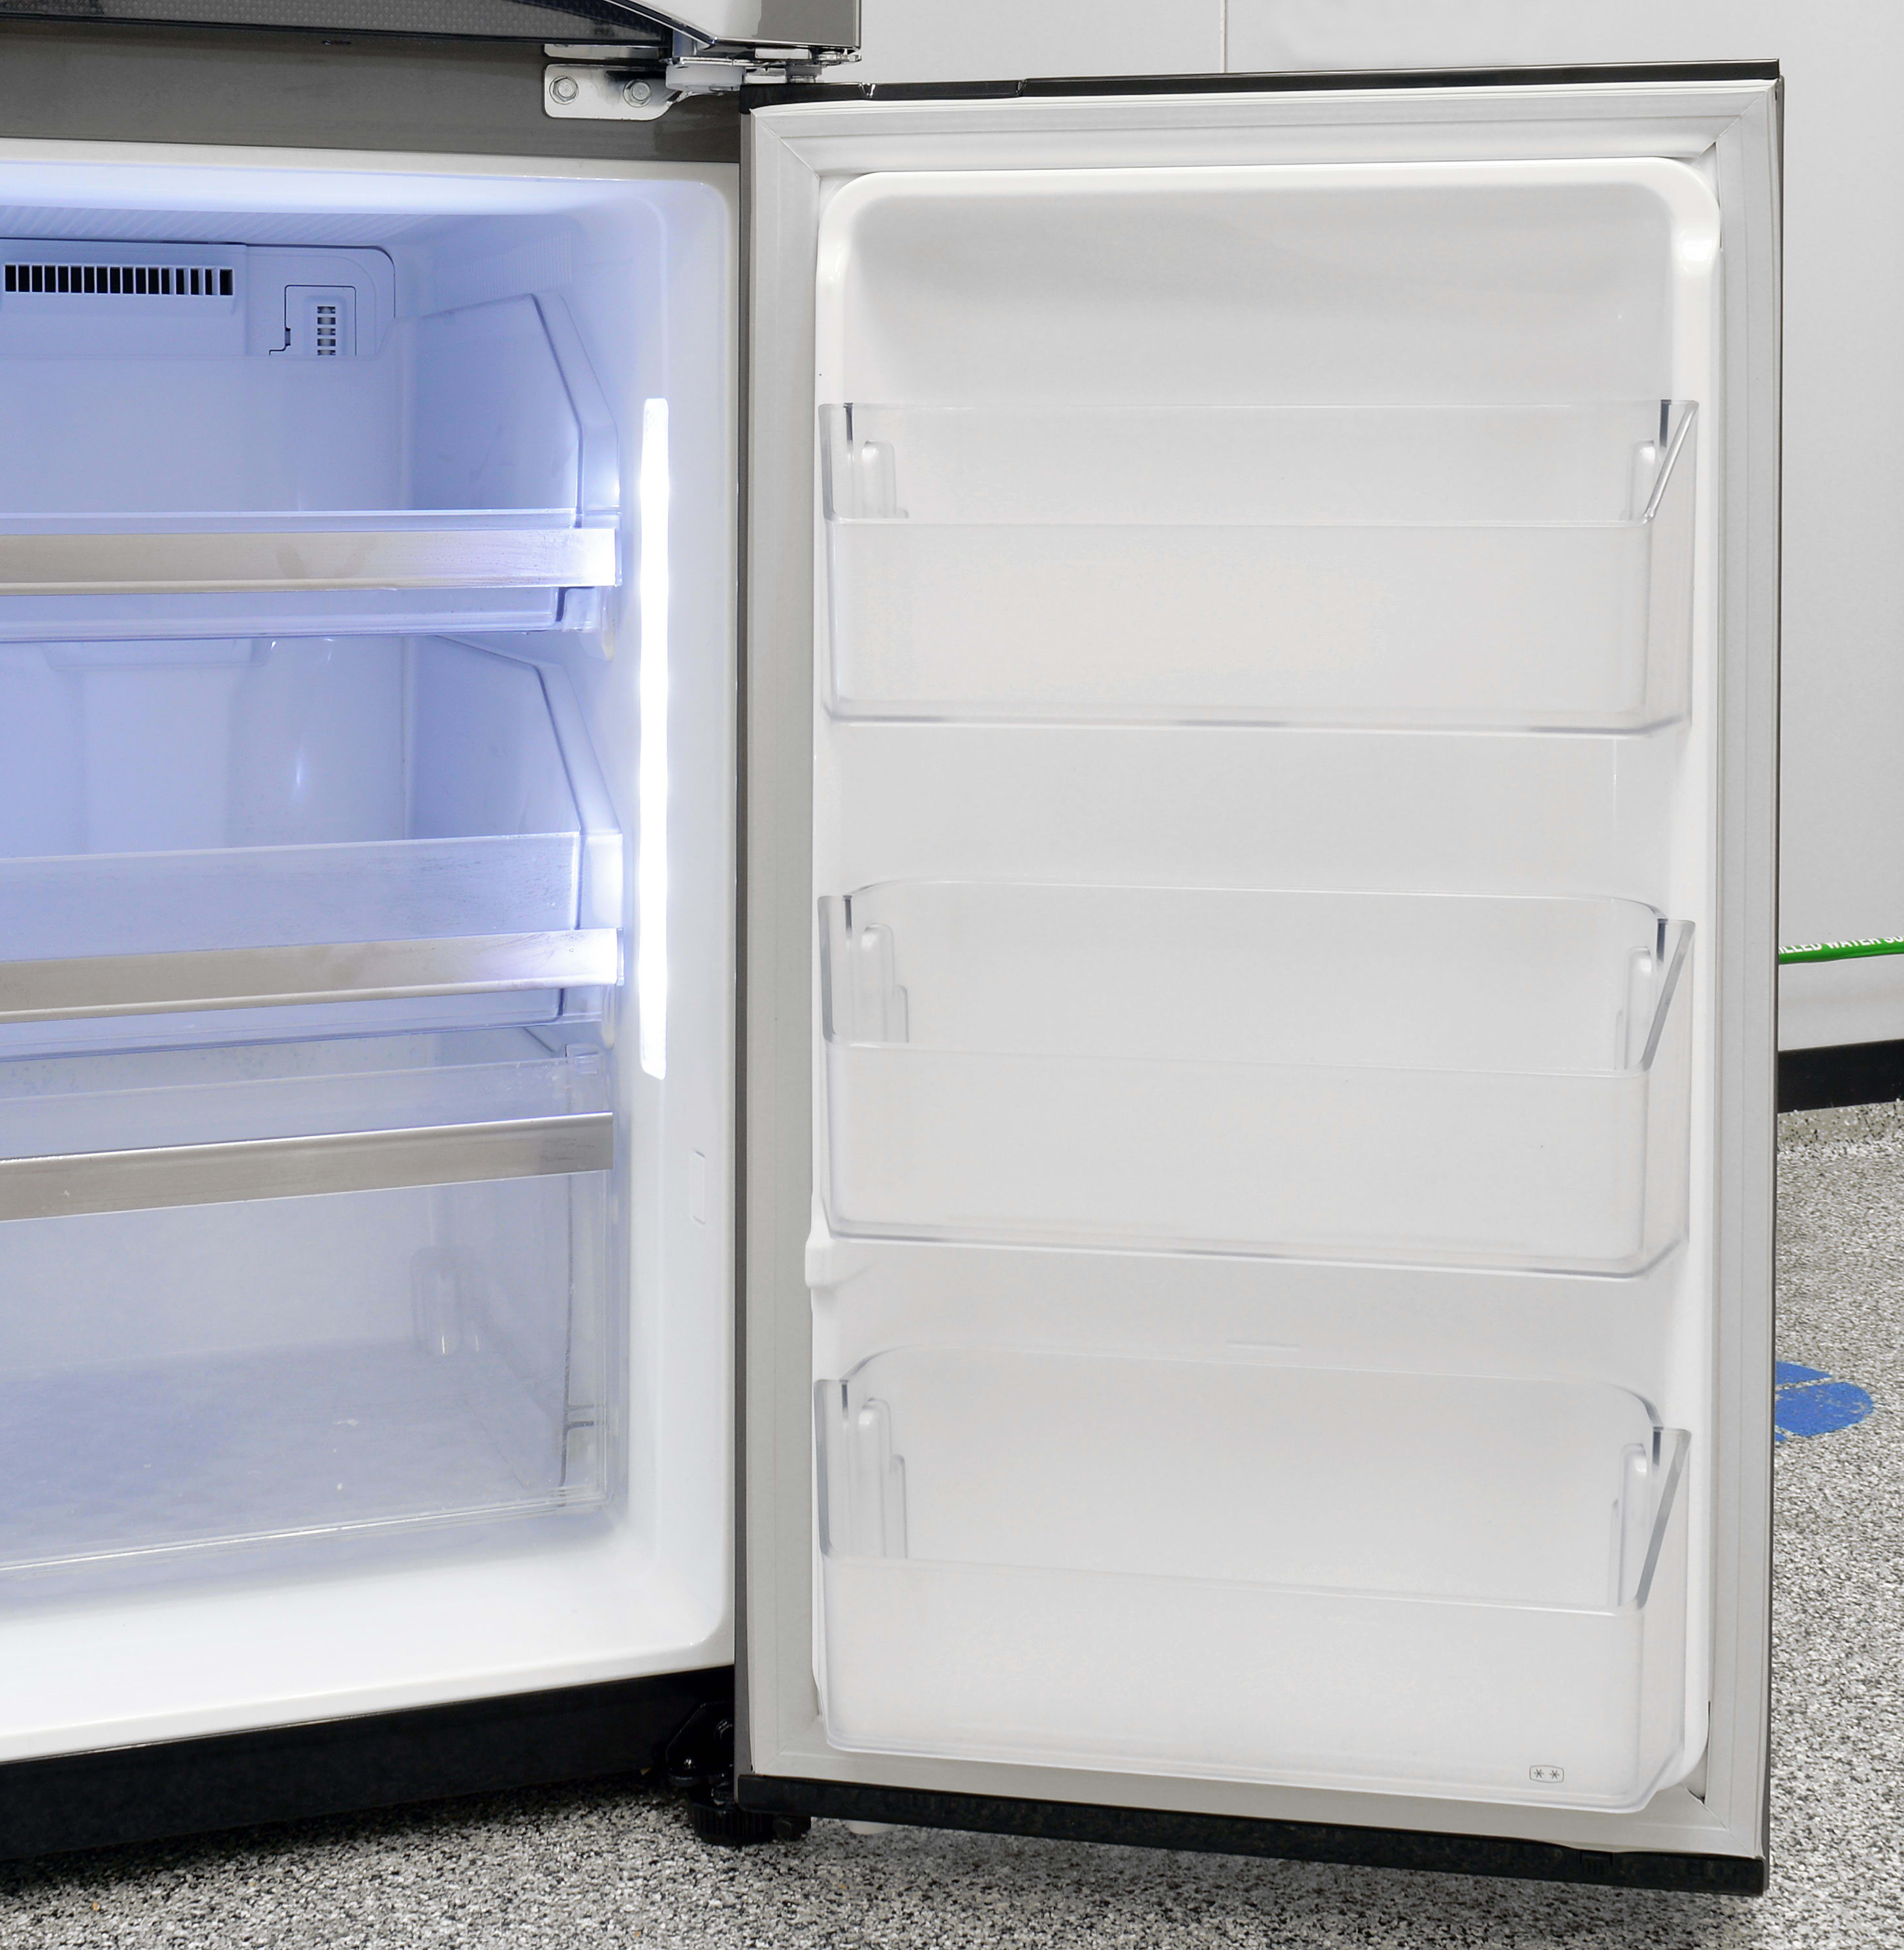 The LG LPXS30866D's freezer door storage on the right is identical to door storage on the left.